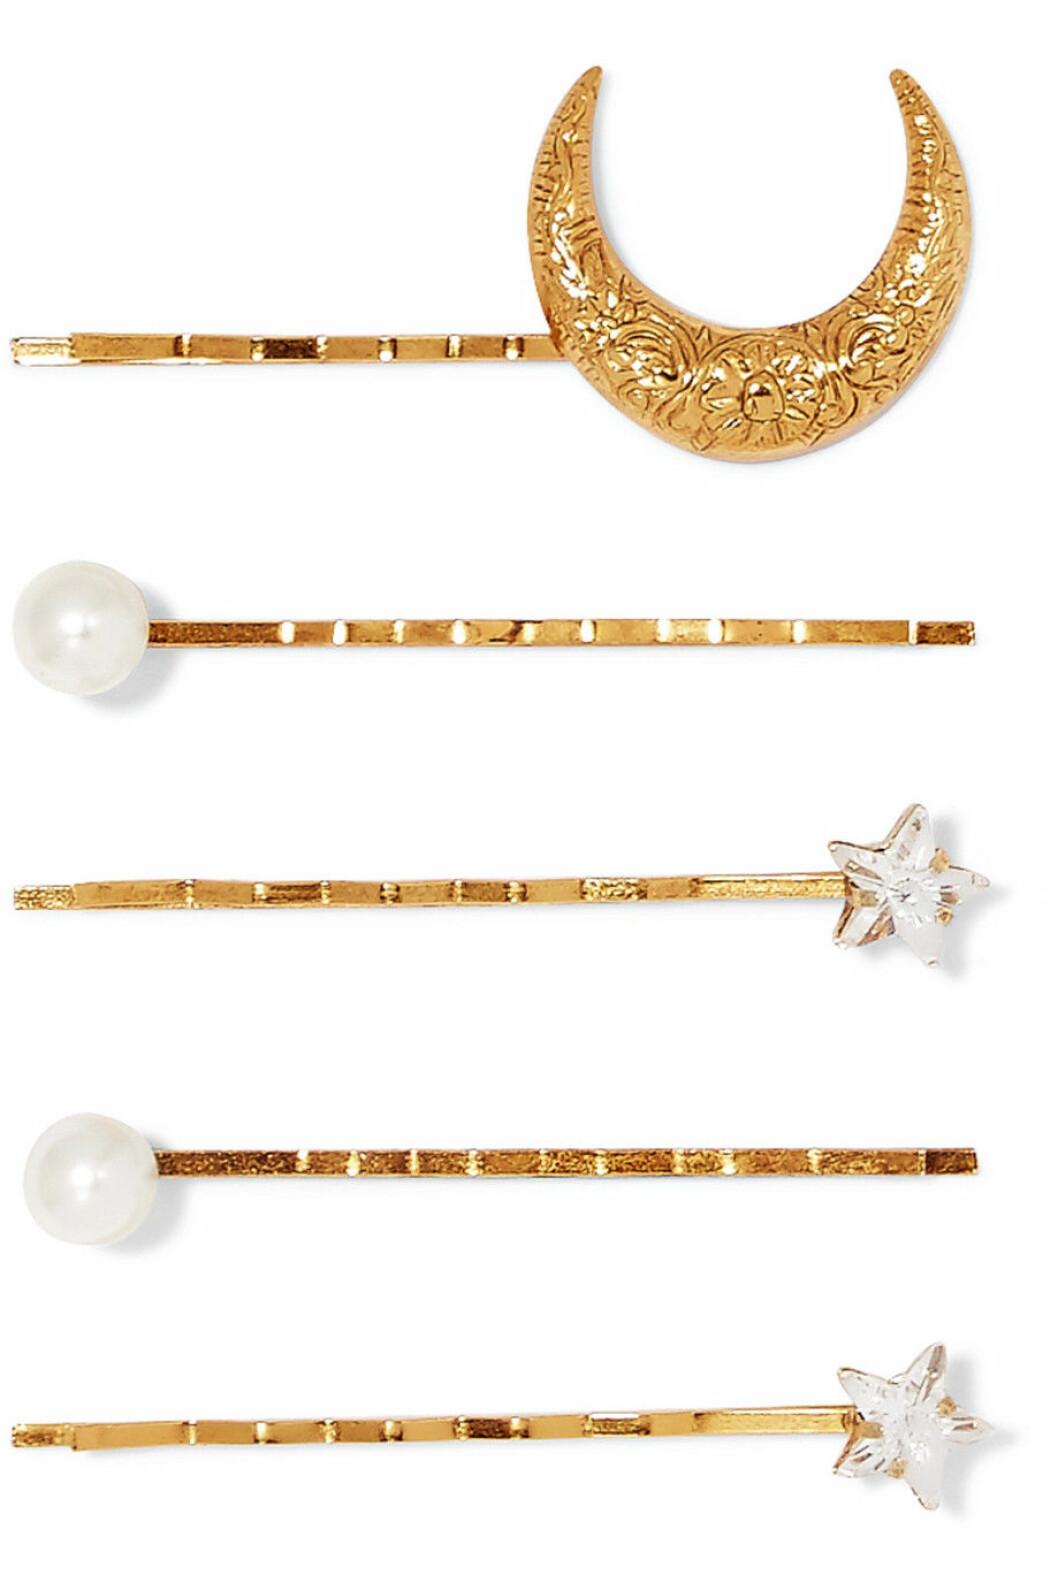 <strong>Jennifer Behr |1150,-| https:</strong>//www.net-a-porter.com/no/en/product/1087007/jennifer_behr/set-of-five-gold-plated--swarovski-crystal-and-faux-pearl-hair-slides